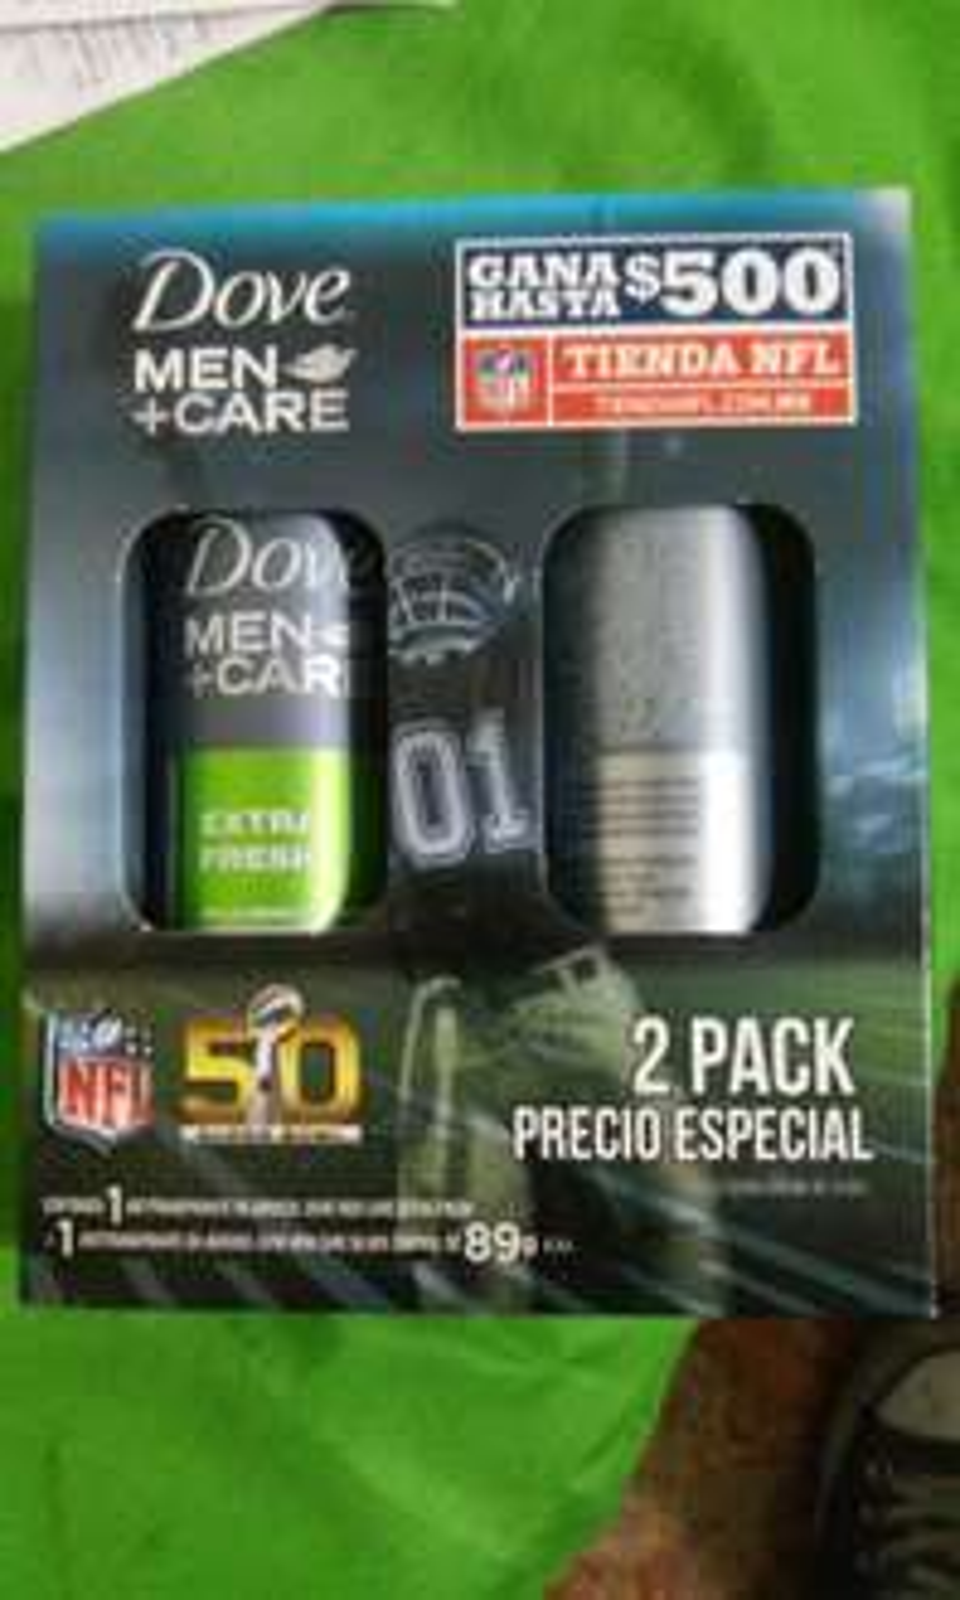 Chedraui: 2 desodorantes dove men $25.10 / Hershey's bites $3.20 / 5 lapices 2HB $2.19 / Boligrafo + lapicero $4.50 / Marcador p/pintarron $4.45